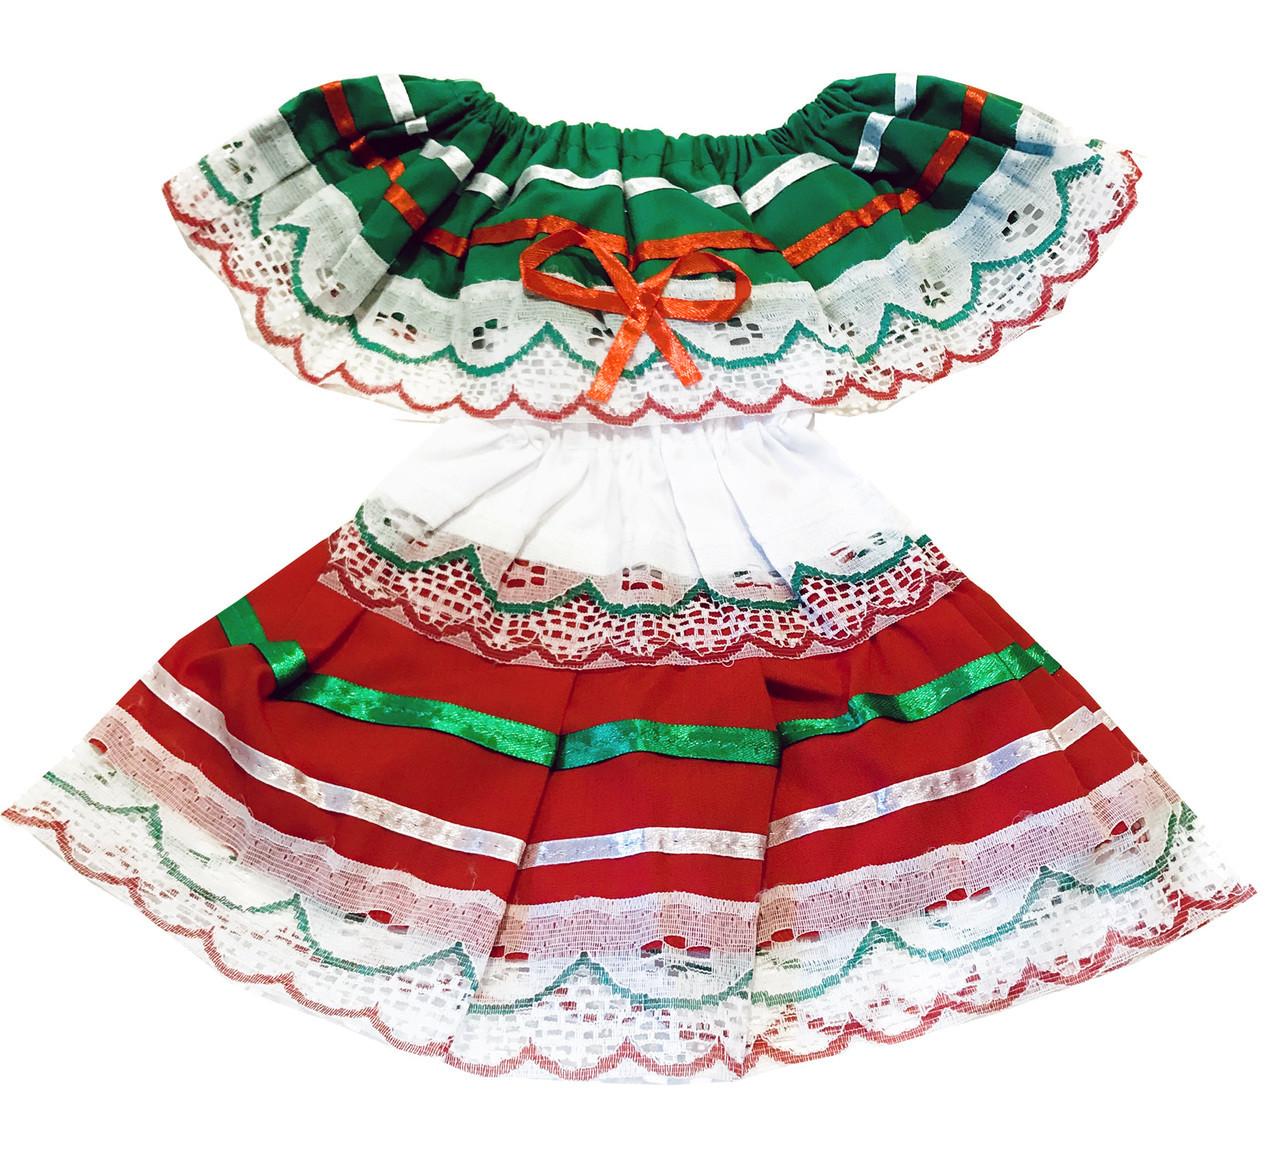 92576d35b Baby Girl Mexican Fiesta Dress Newborn - Size XS - My Mercado Mexican  Imports